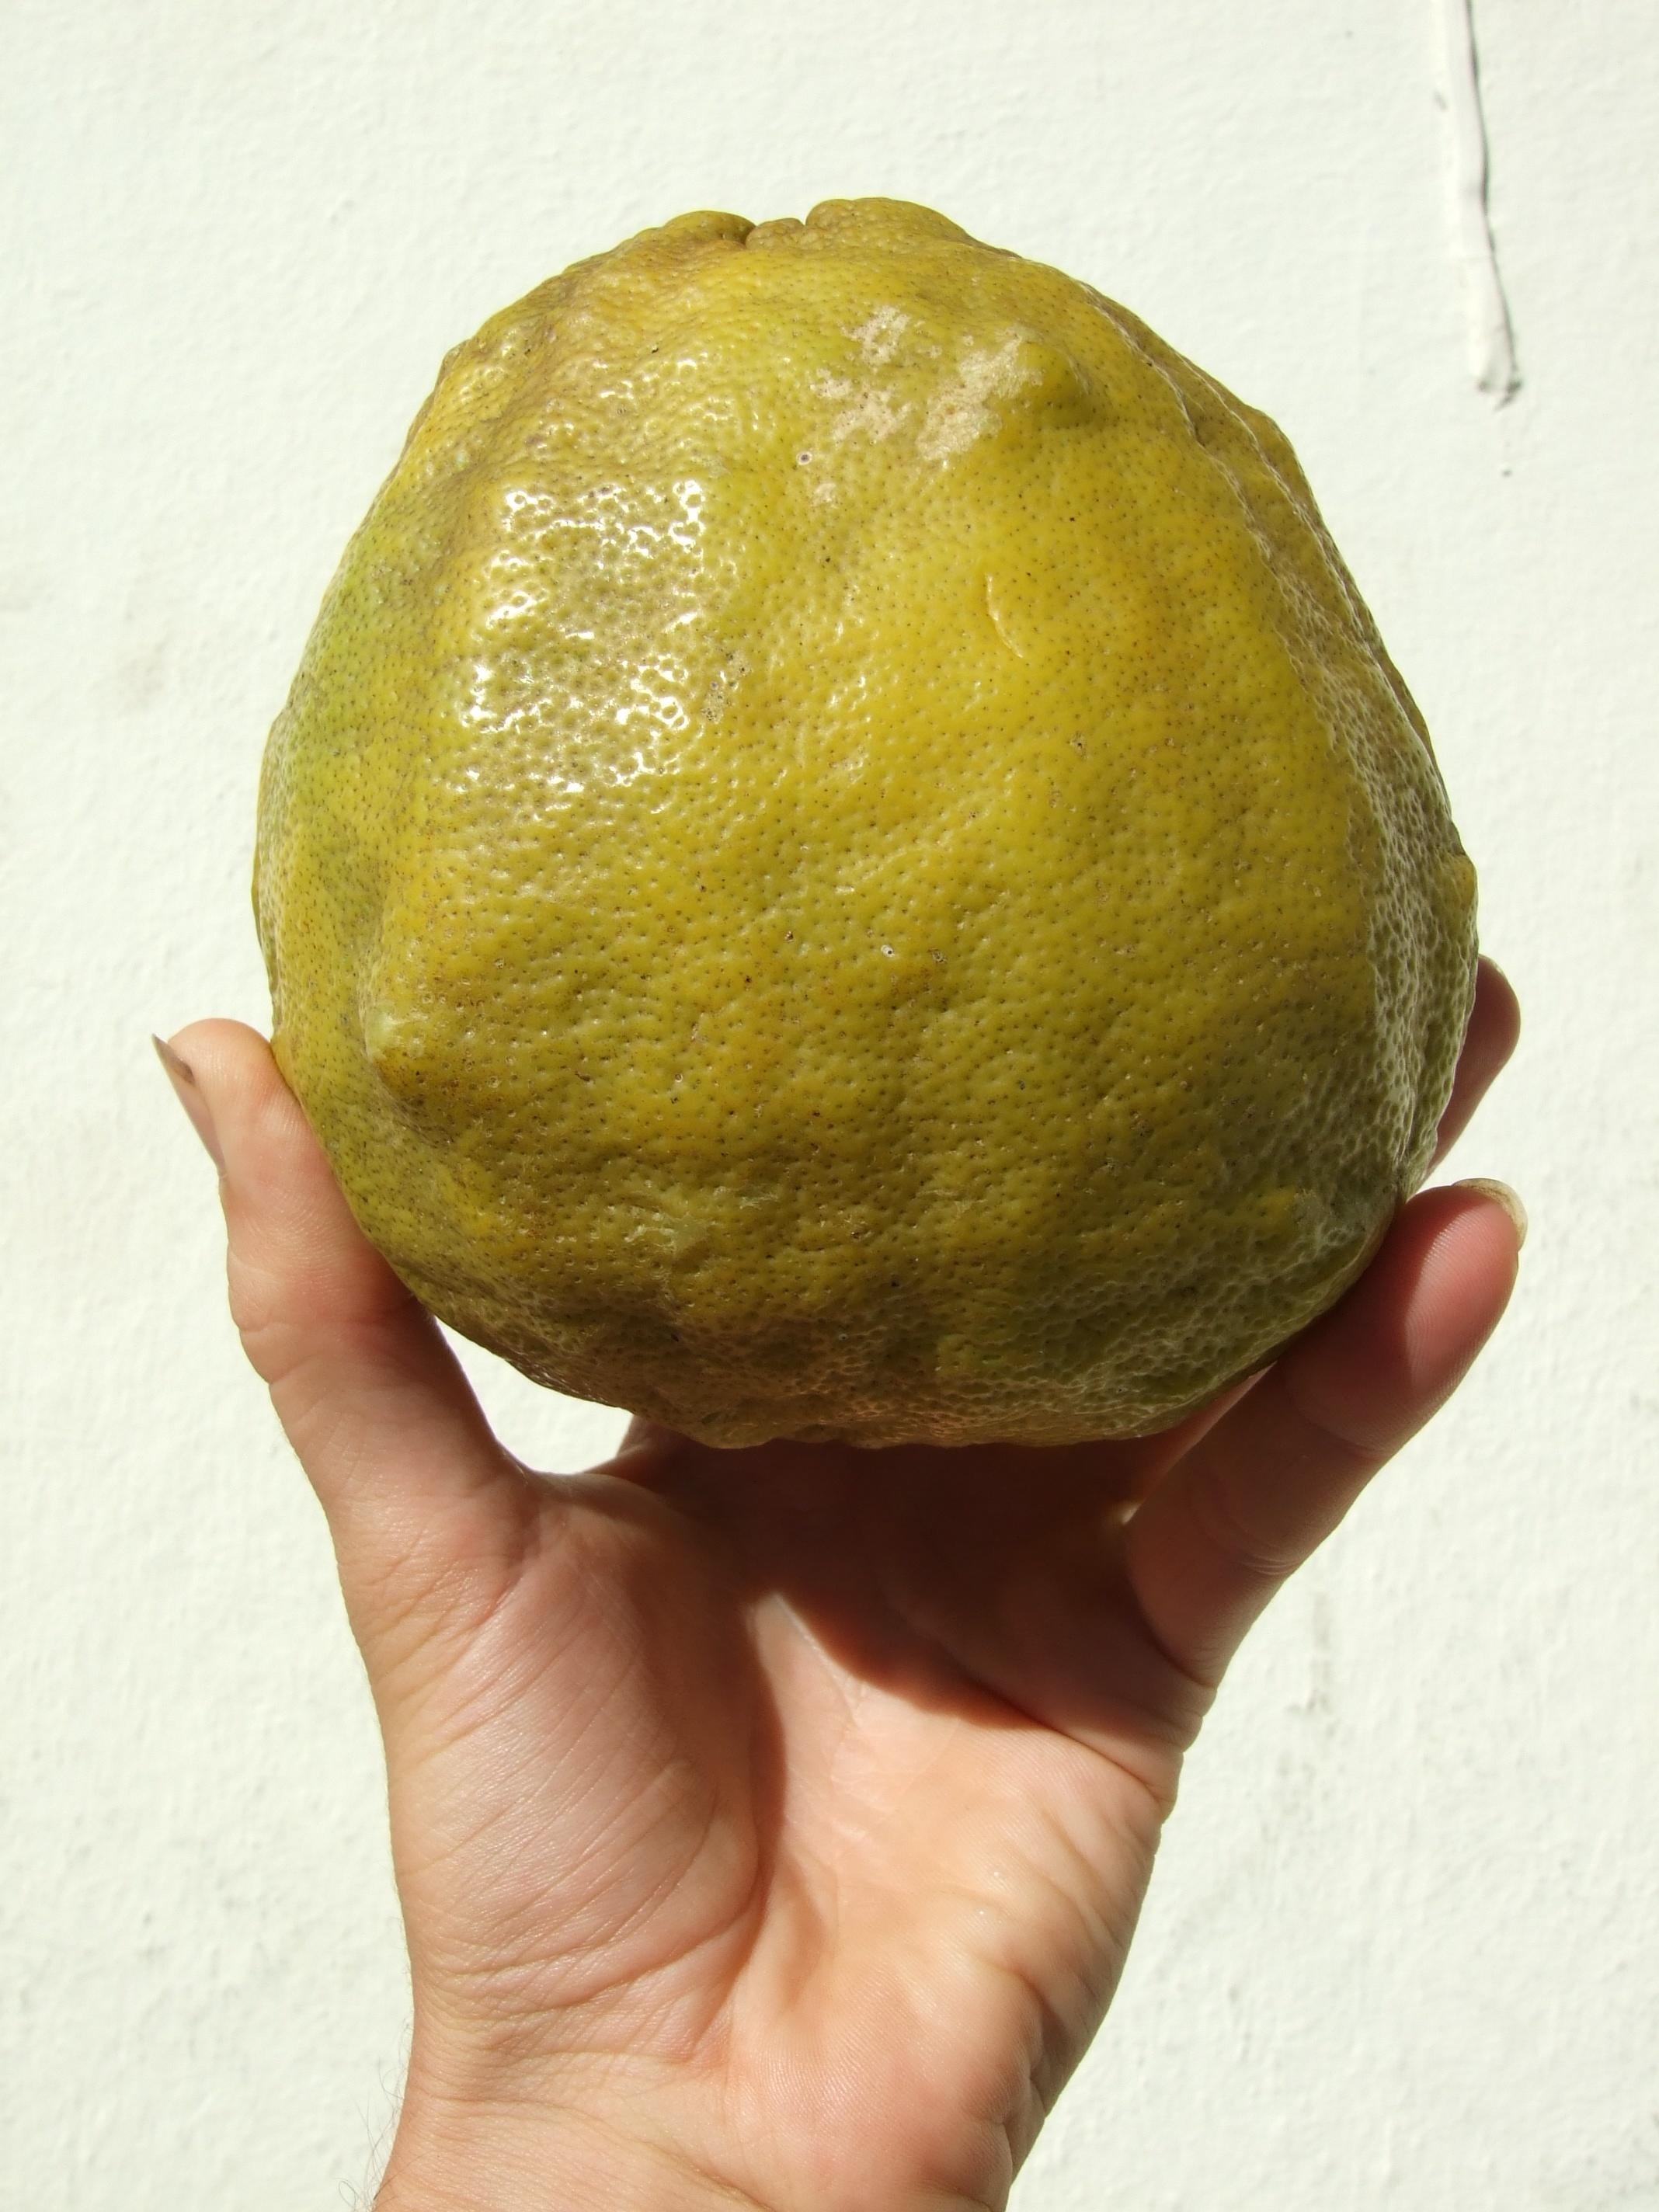 large-citrus.jpg